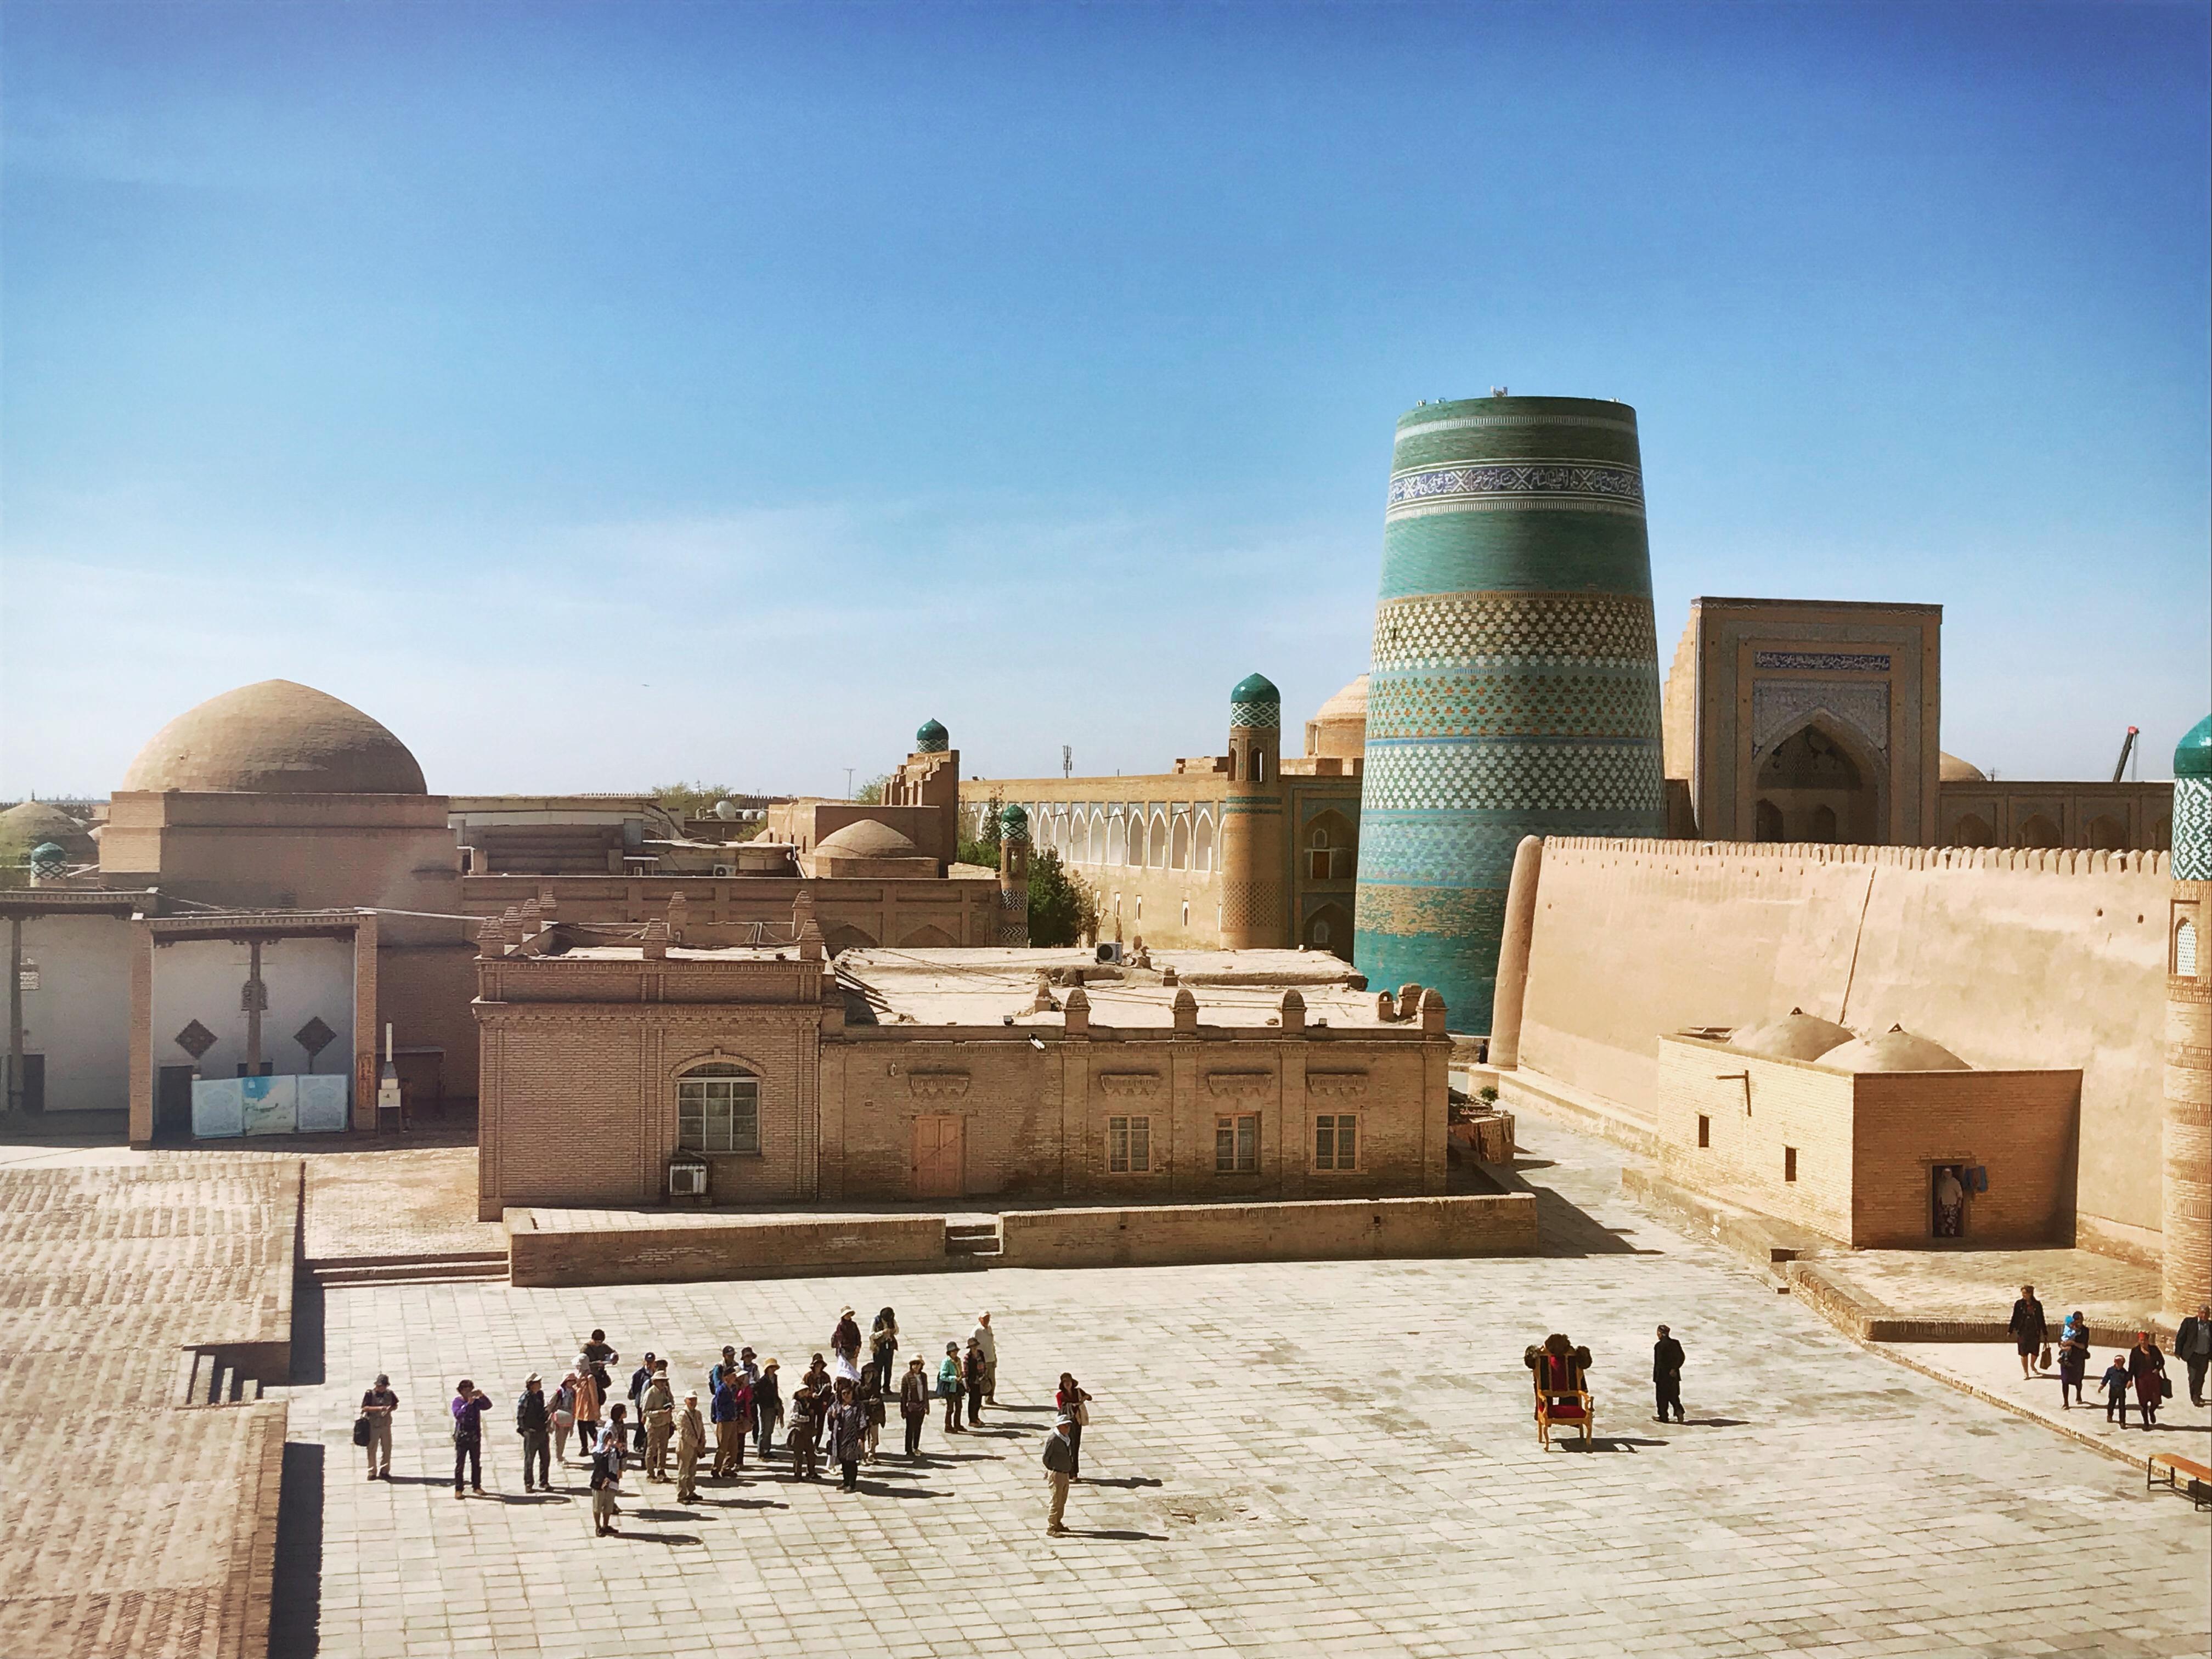 Usbekistand kscheib Khiwa